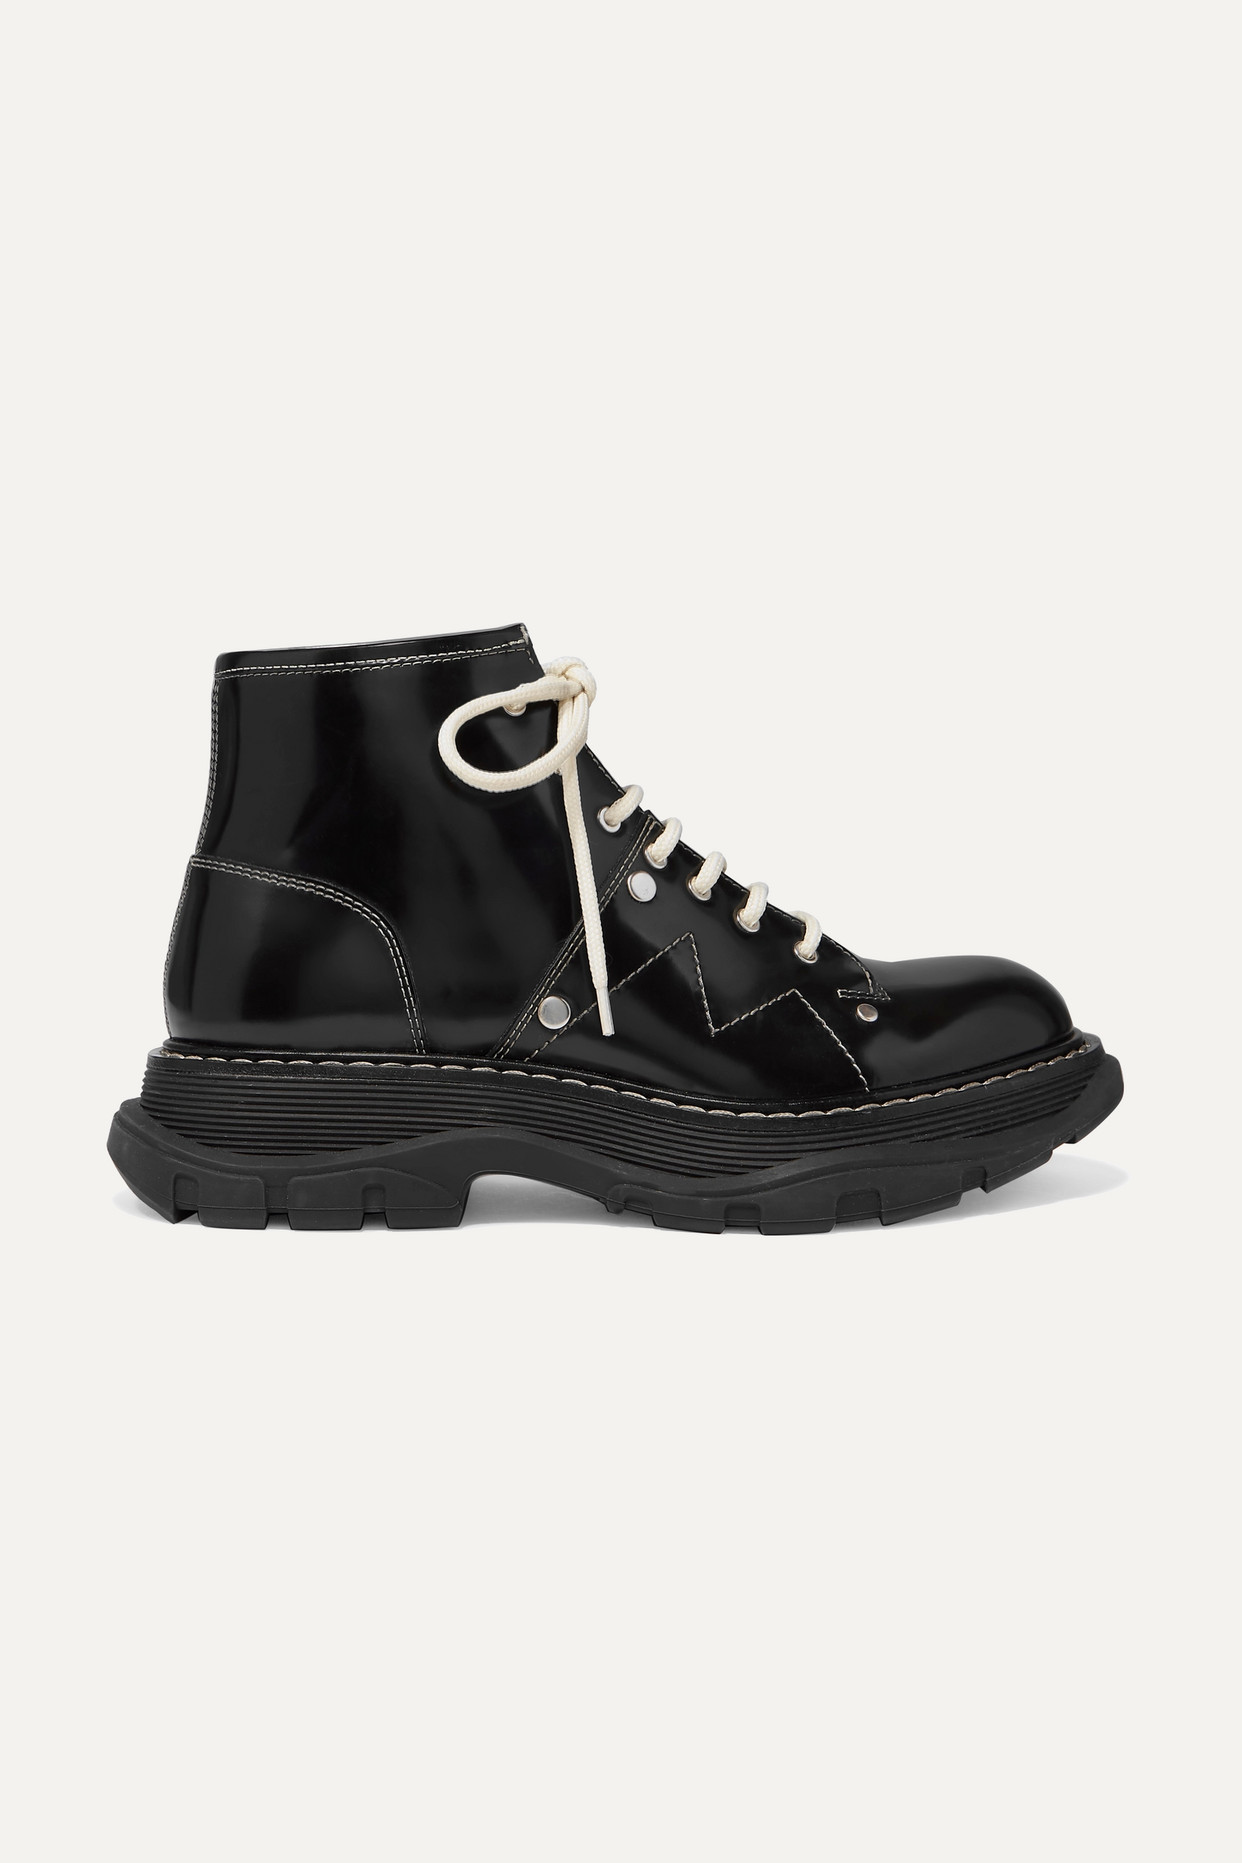 ALEXANDER MCQUEEN - 亮面皮革厚底踝靴 - 黑色 - IT41